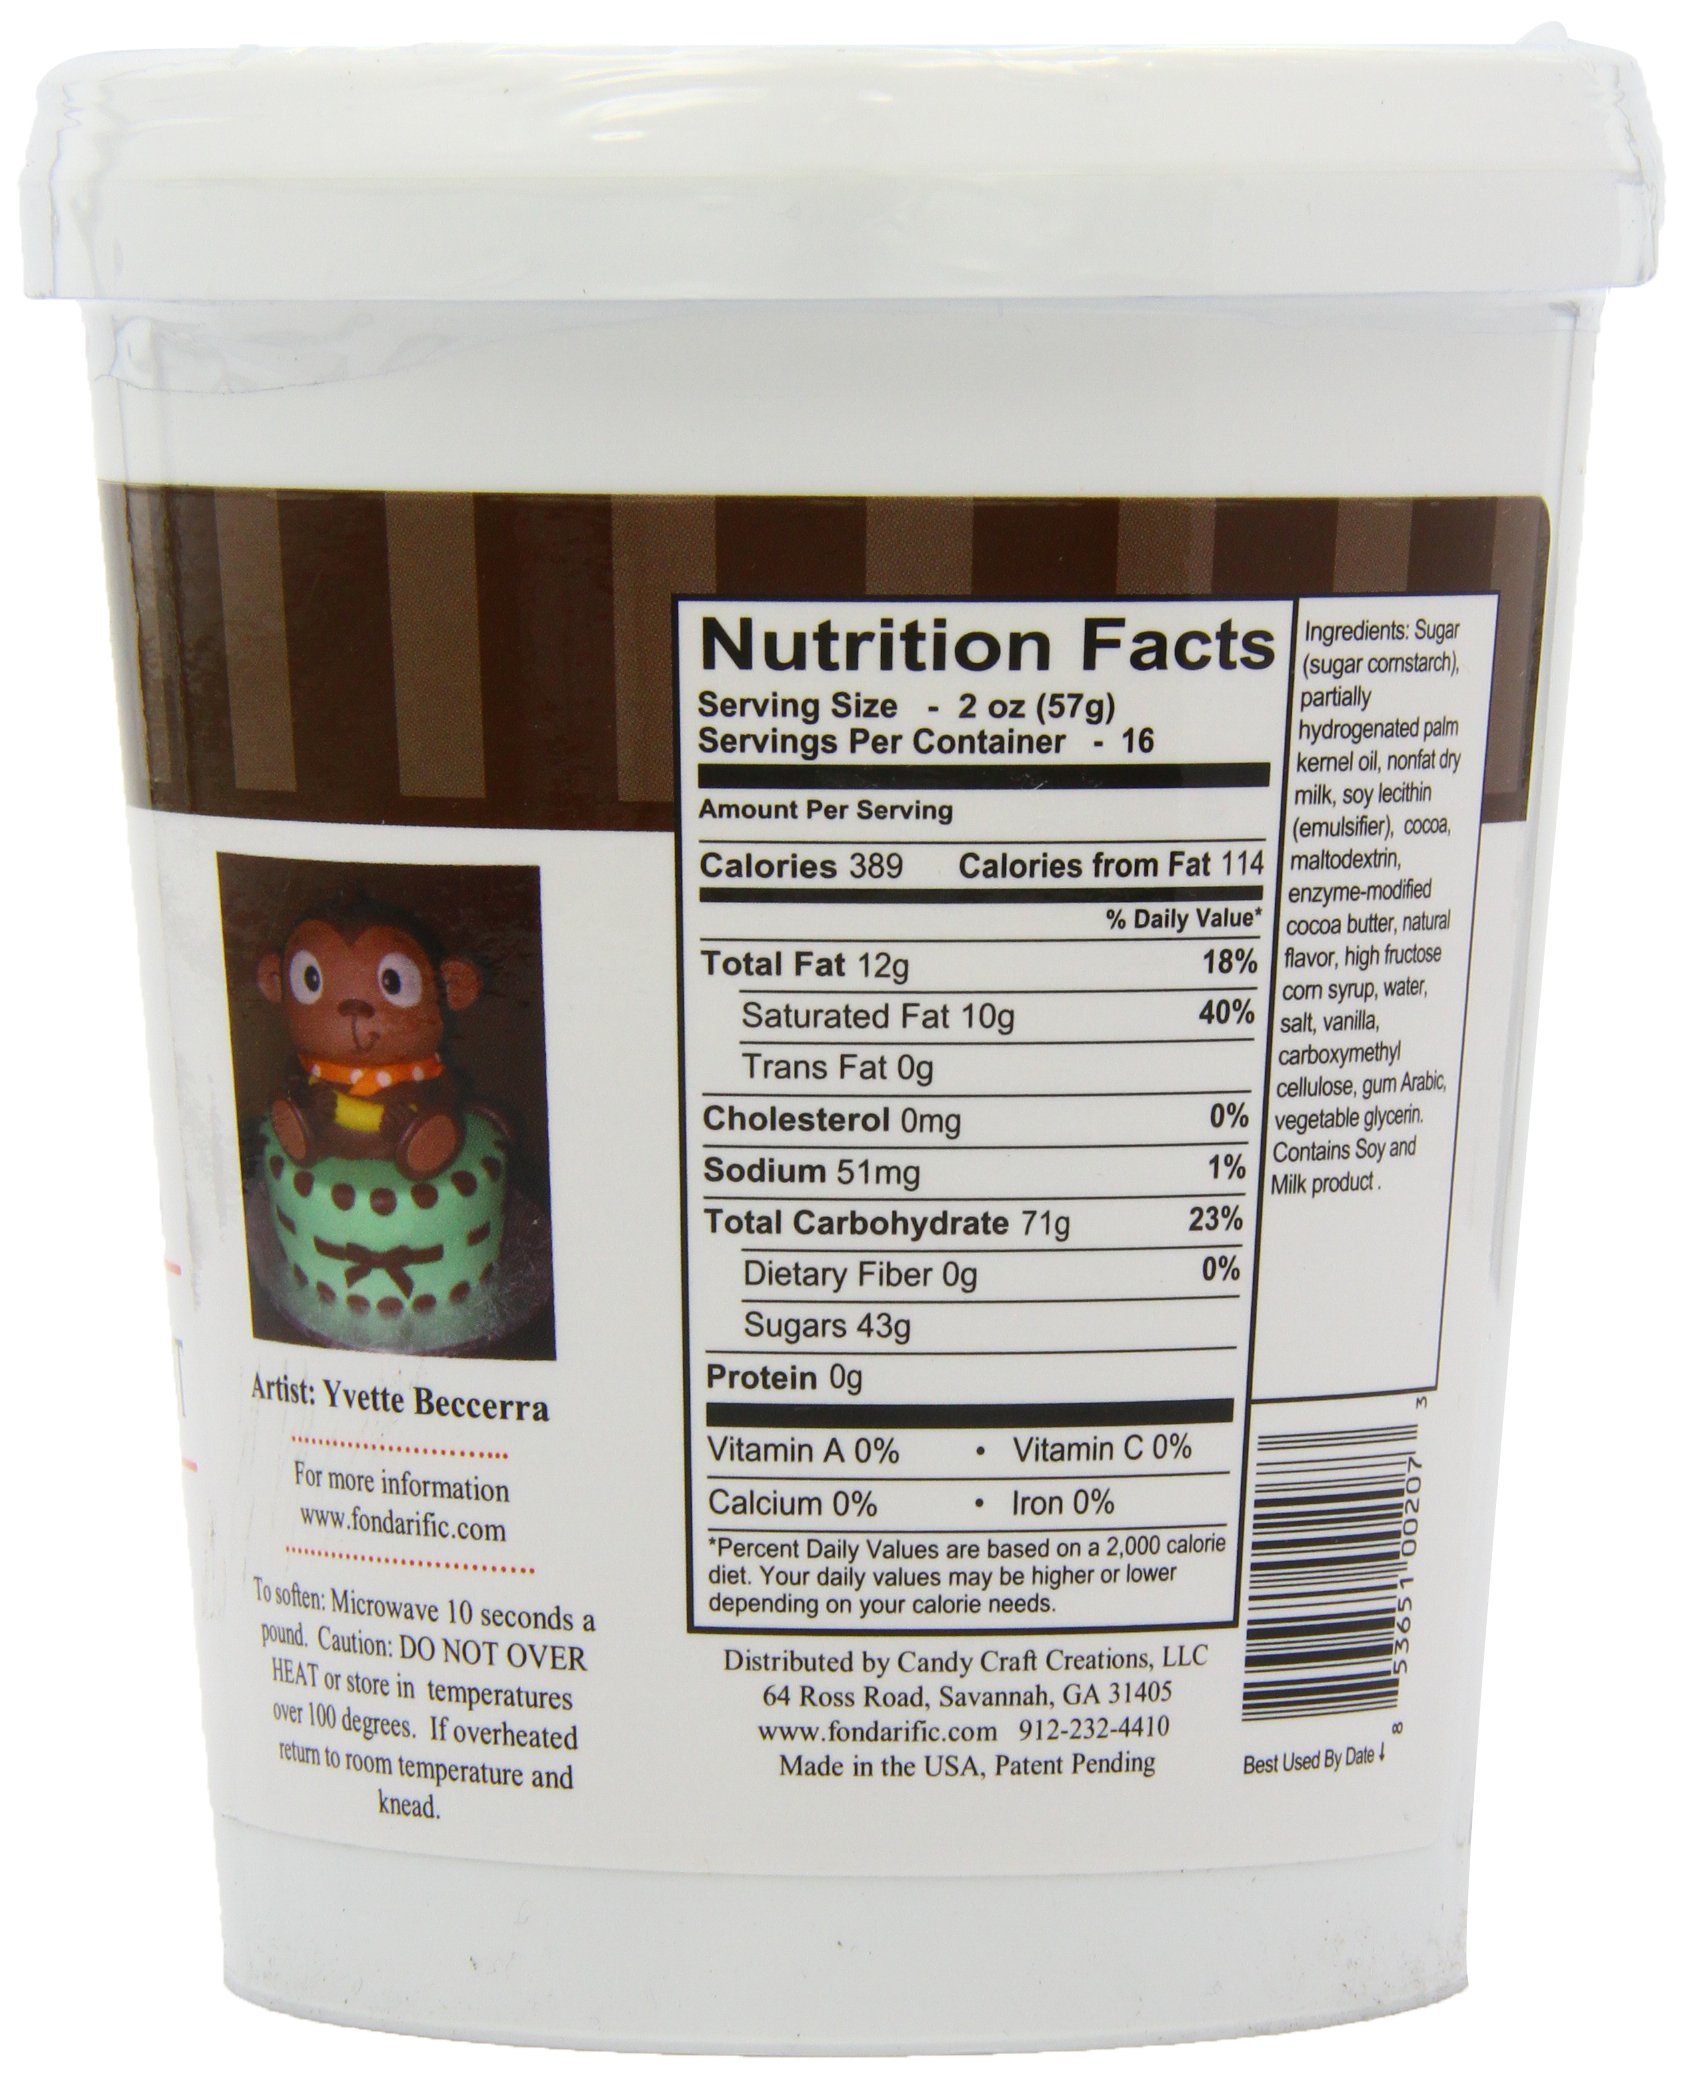 Fondarific Chocolate Fondant Brown, 2-Pounds by Fondarific (Image #6)